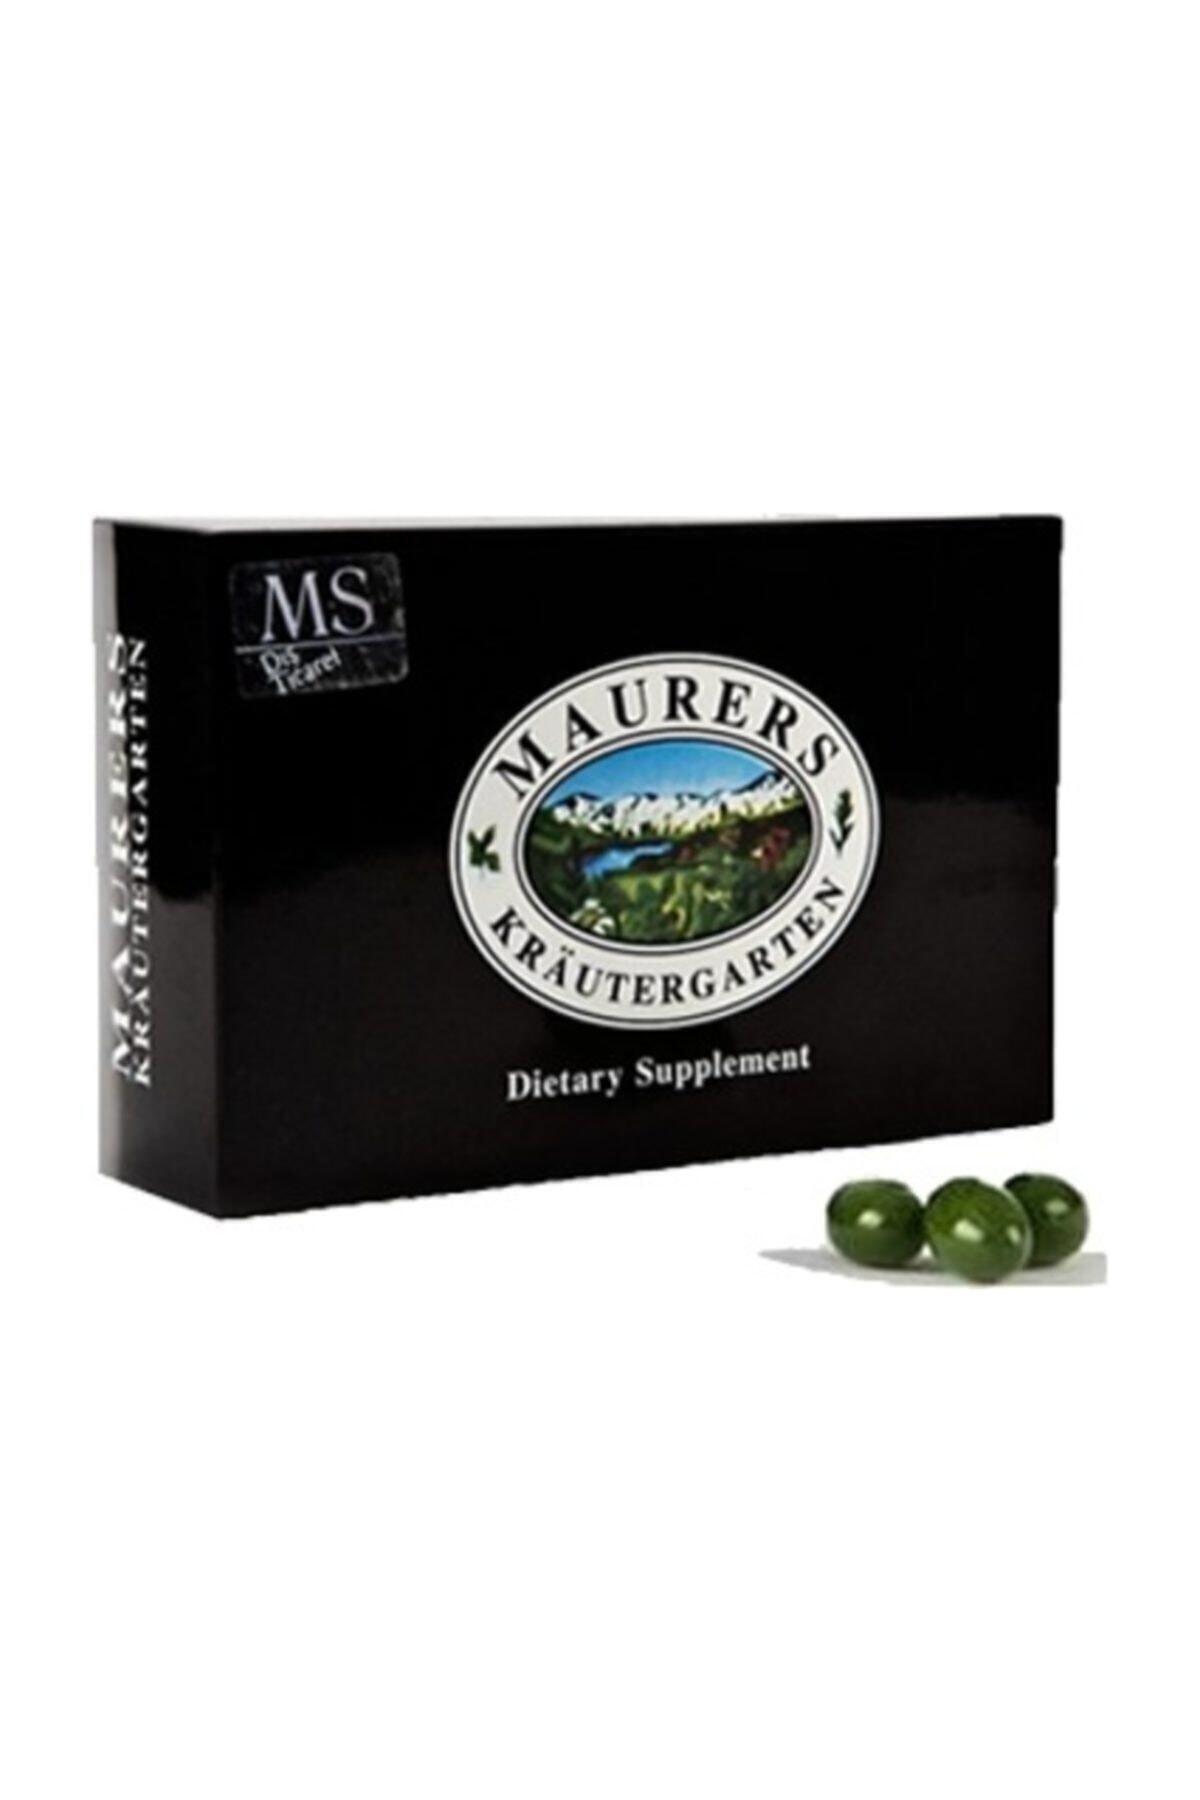 Maurers Krautergarten 800 Mg Lık Bitkisel Gıda Takviyesi 1